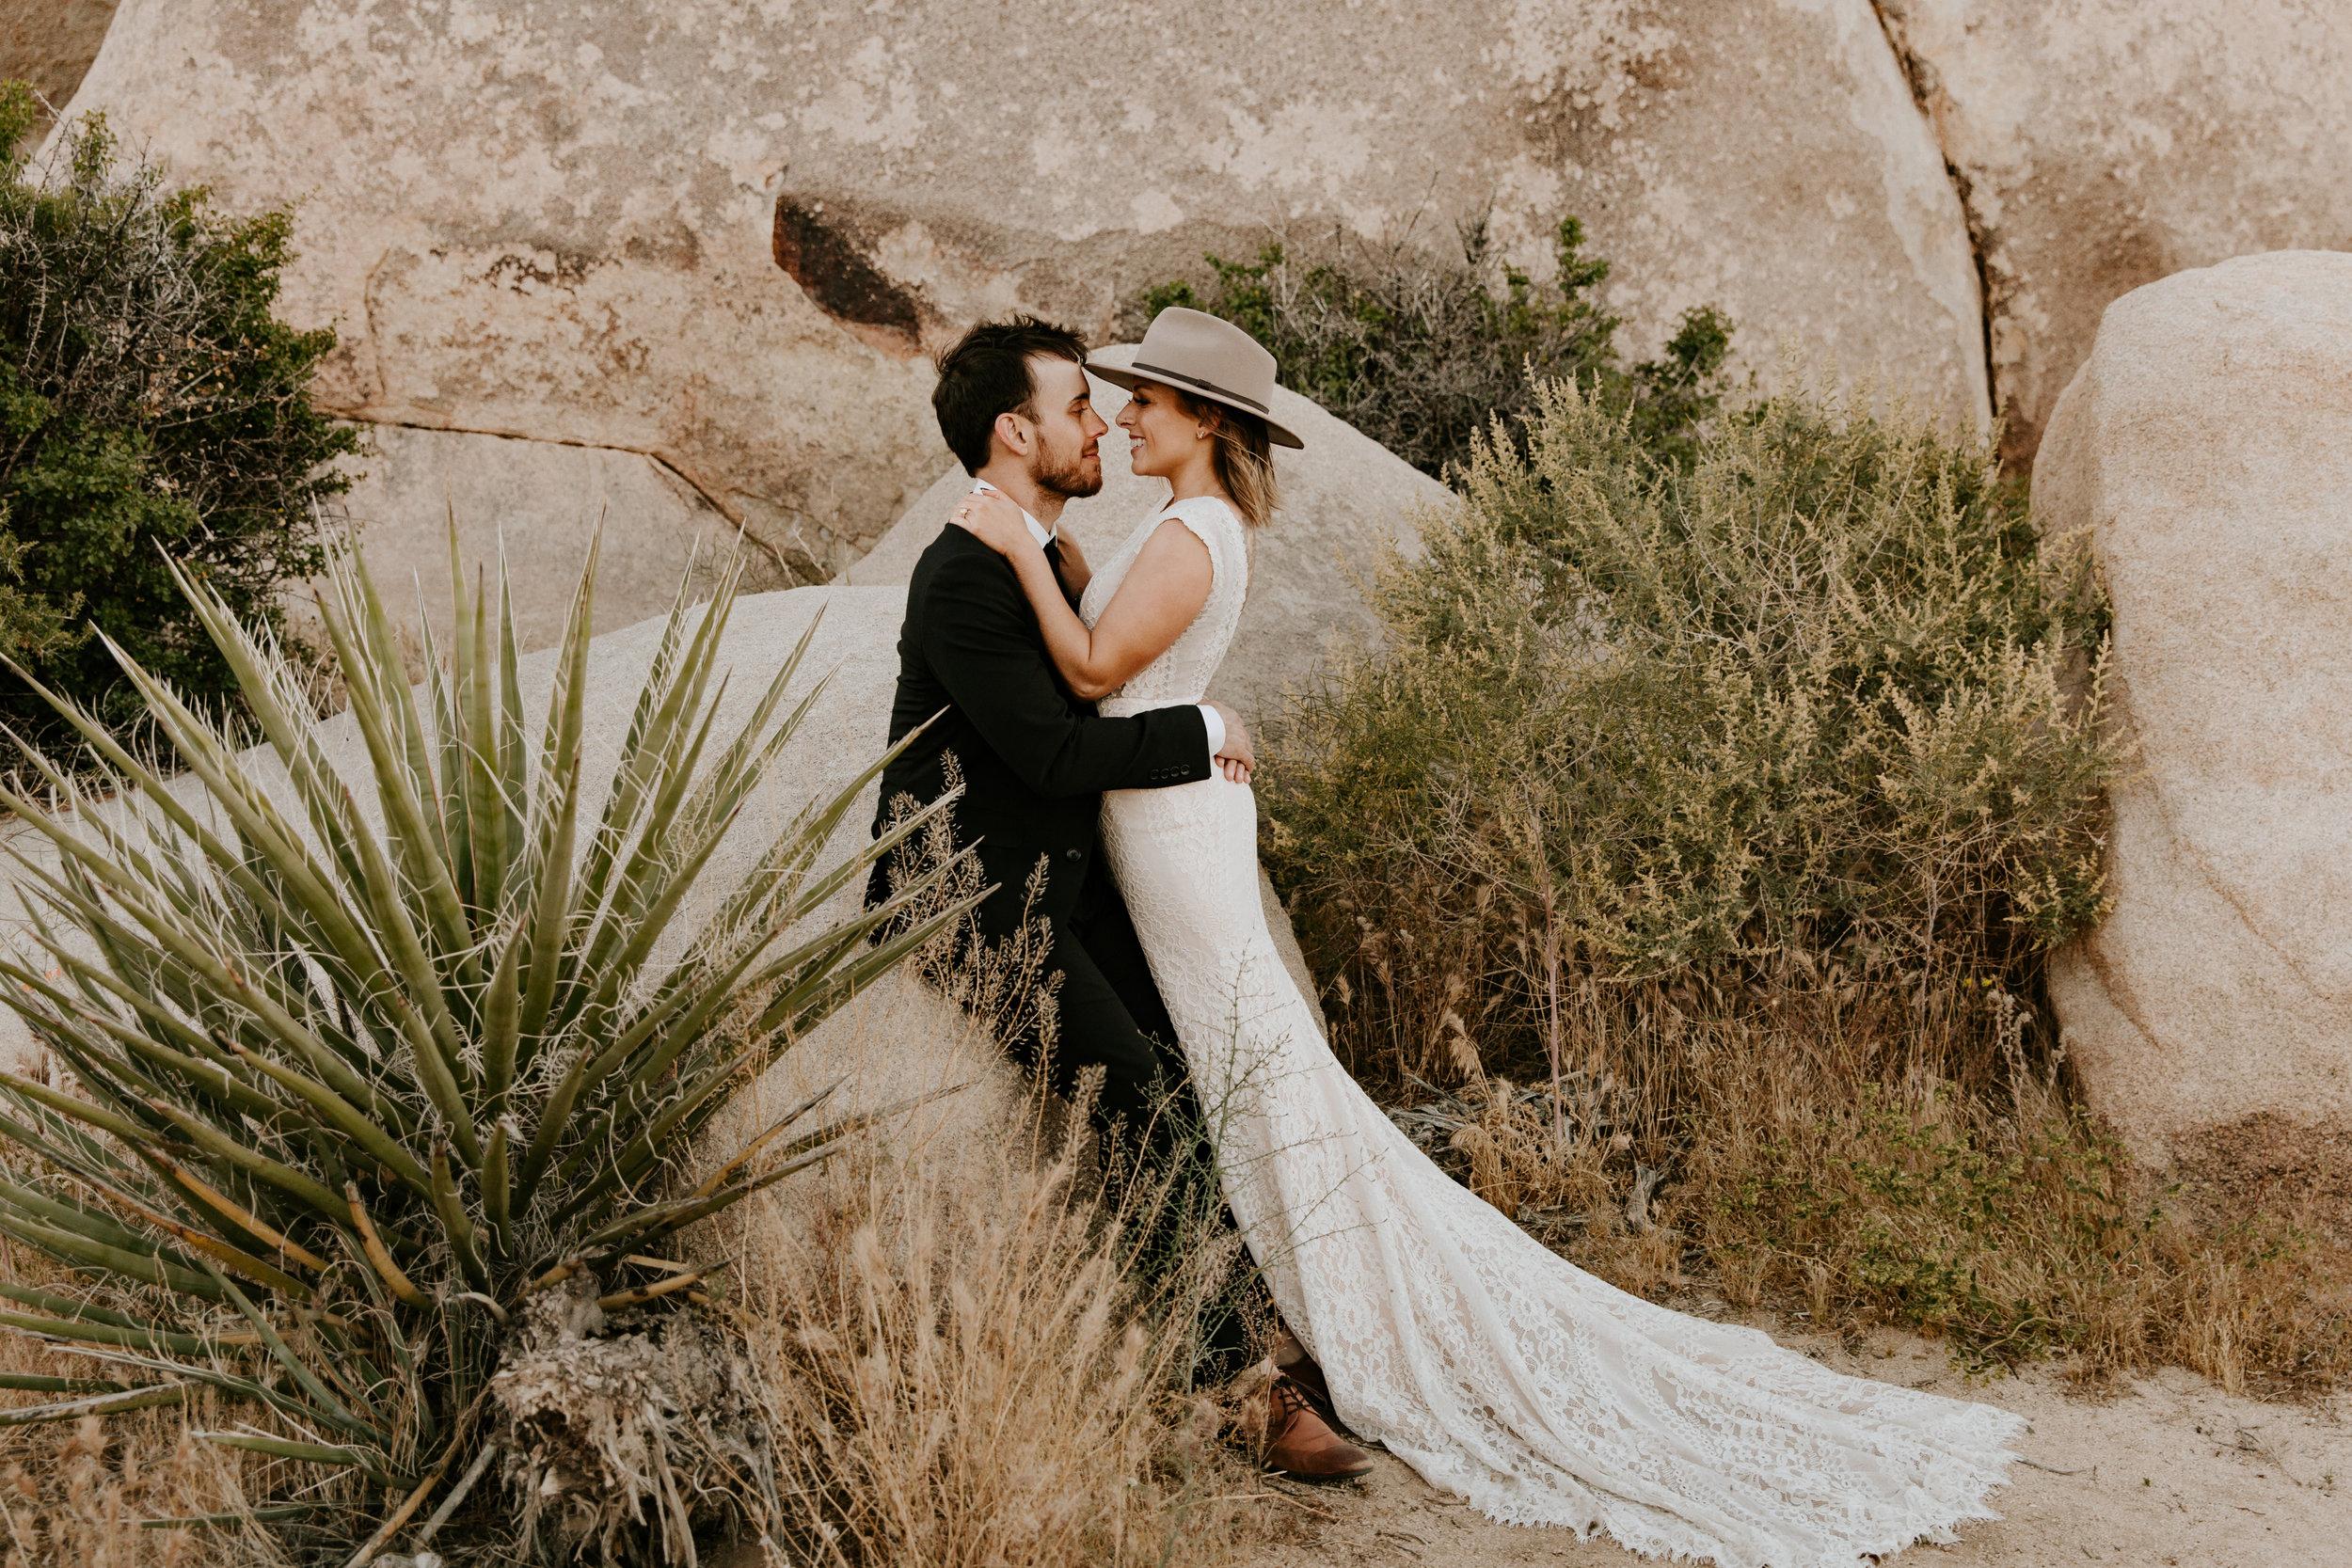 2019-05-26_Callie-Evan_Wedding_Joshua Tree_Paige Nelson_PREVIEWS HR-59.jpg